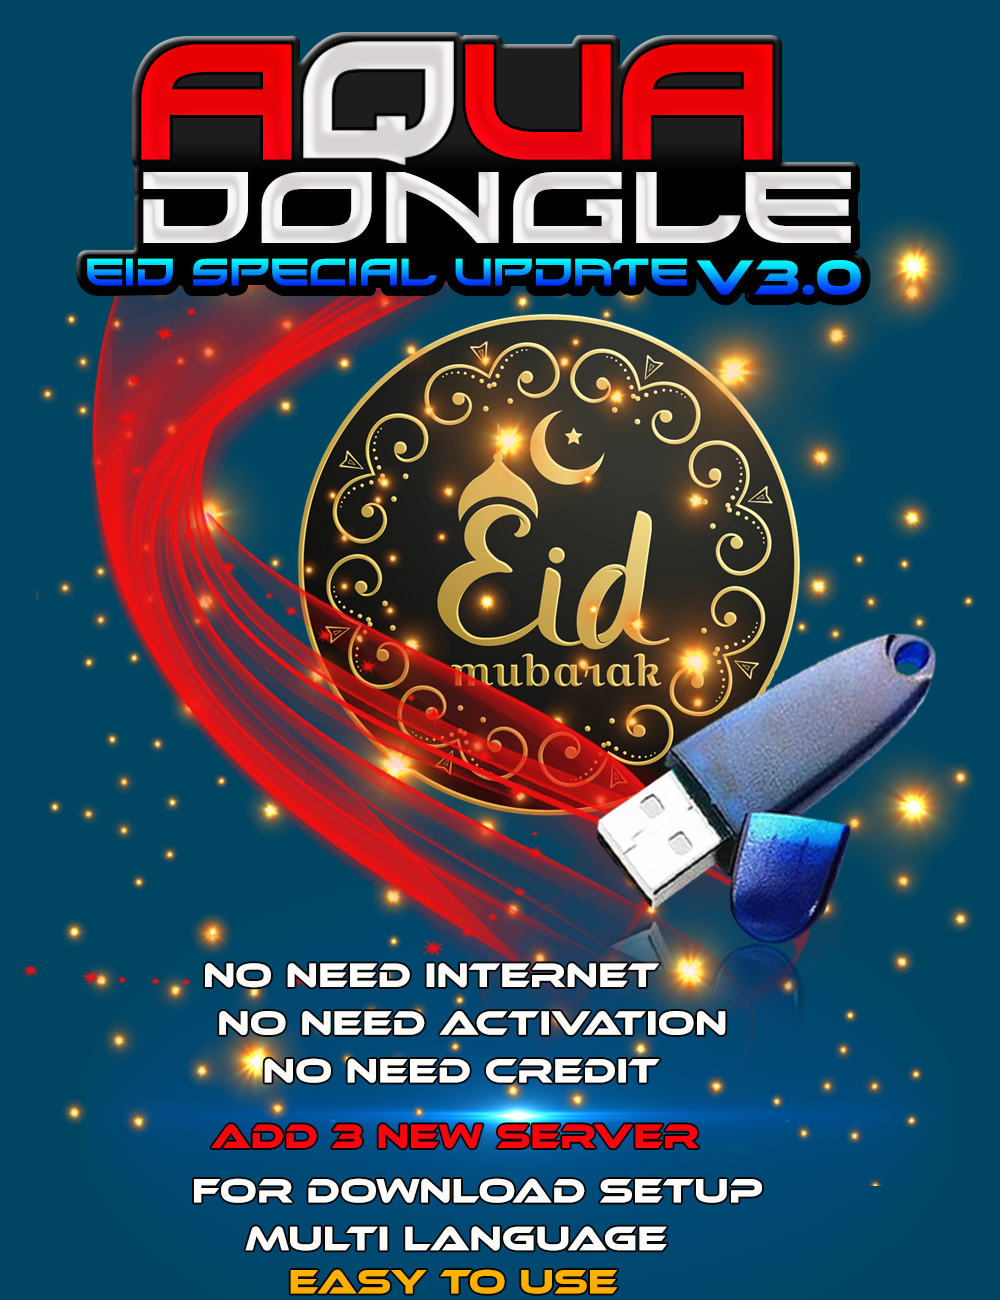 AQUA Dongle A.I.O Eid Special SPD & MTK Update V3.0 Released 31-Jul-2020